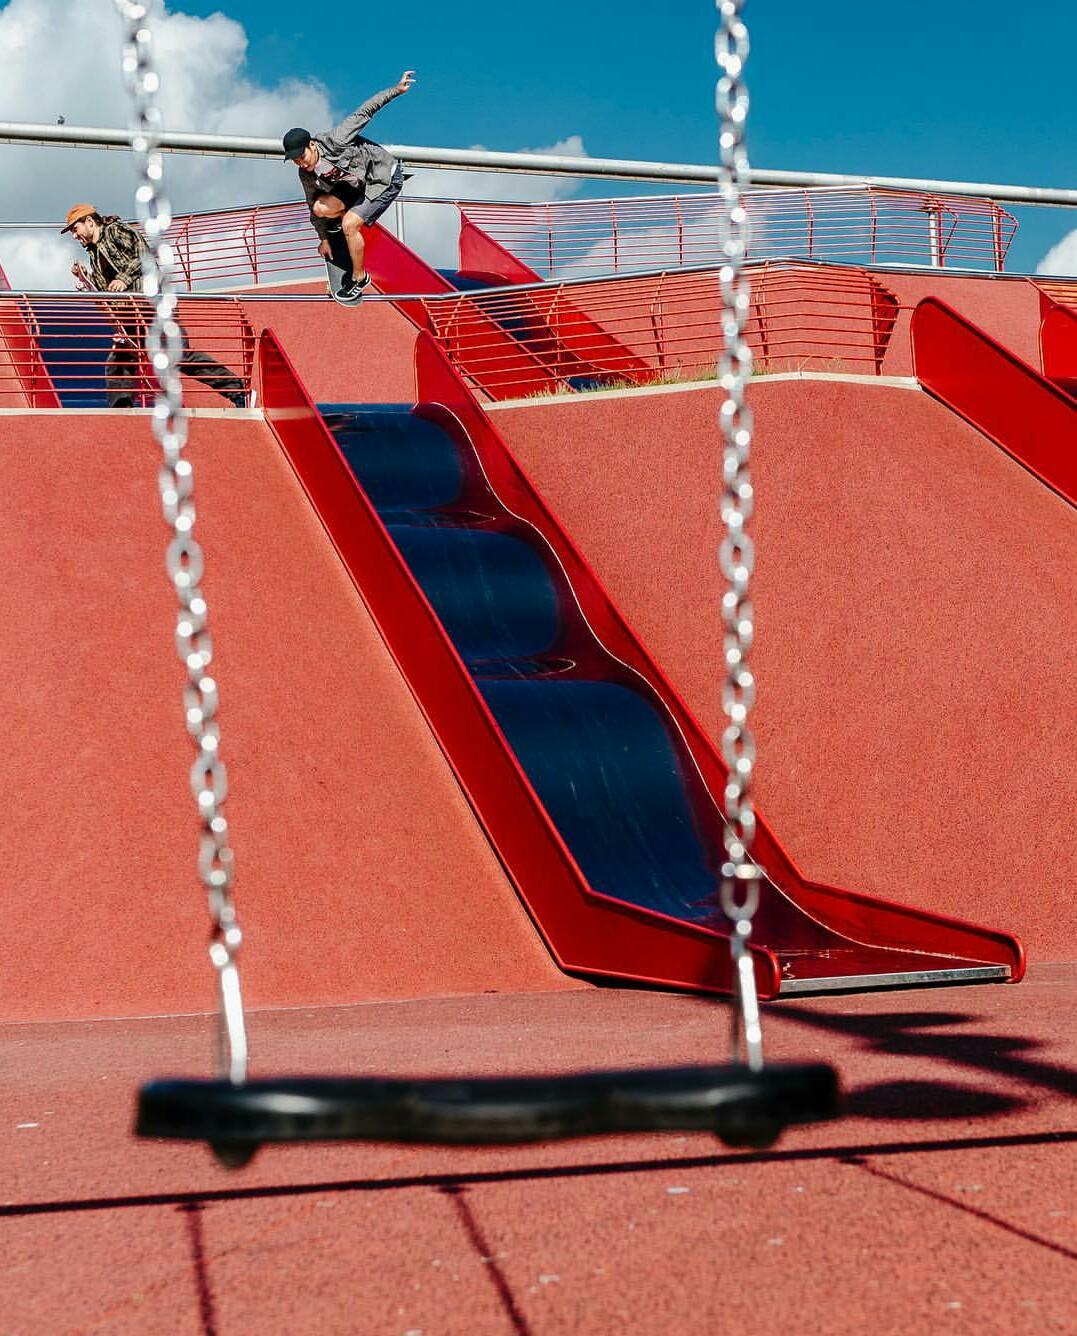 Calvin_Barcelona Pull In.jpg